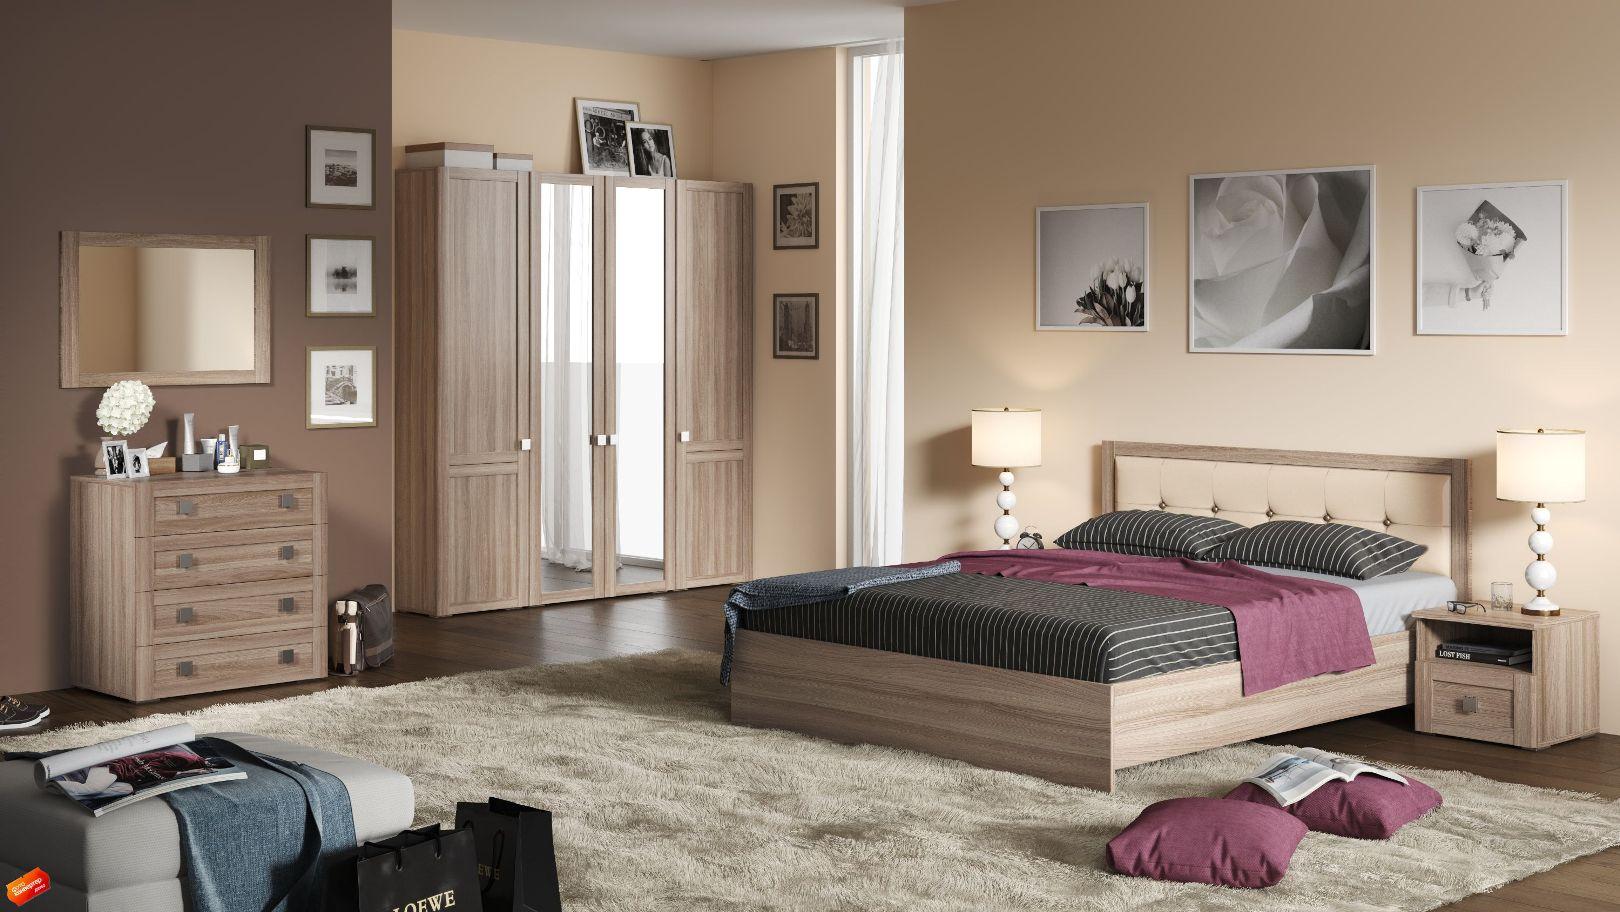 Модульная спальня Корсика Композиция-2 модульная спальня корсика композиция 1